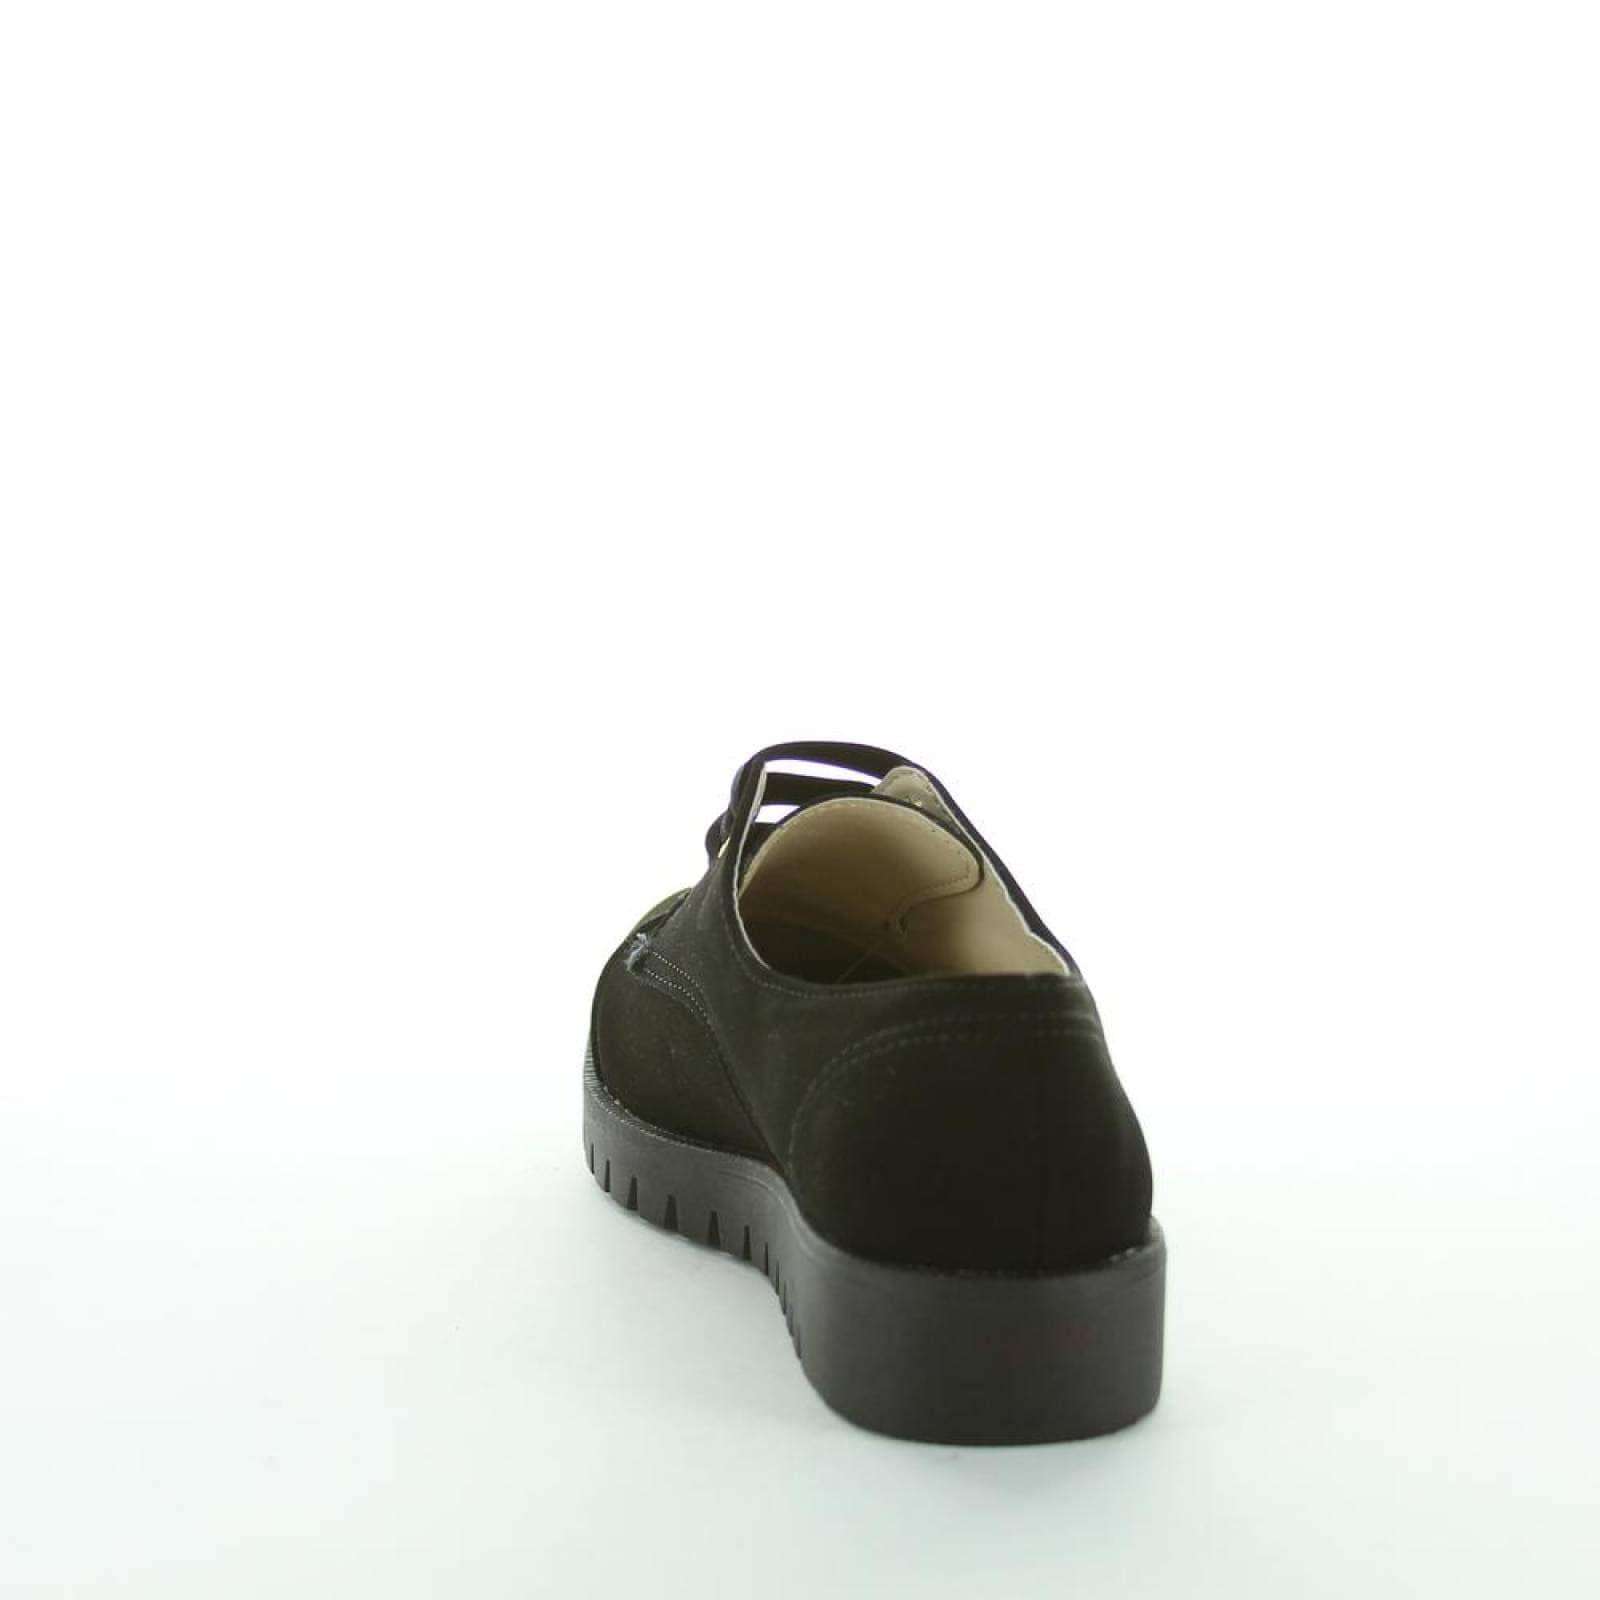 Zapato Cerrado Lory Mujer Negro Tipo Nobuk 9030